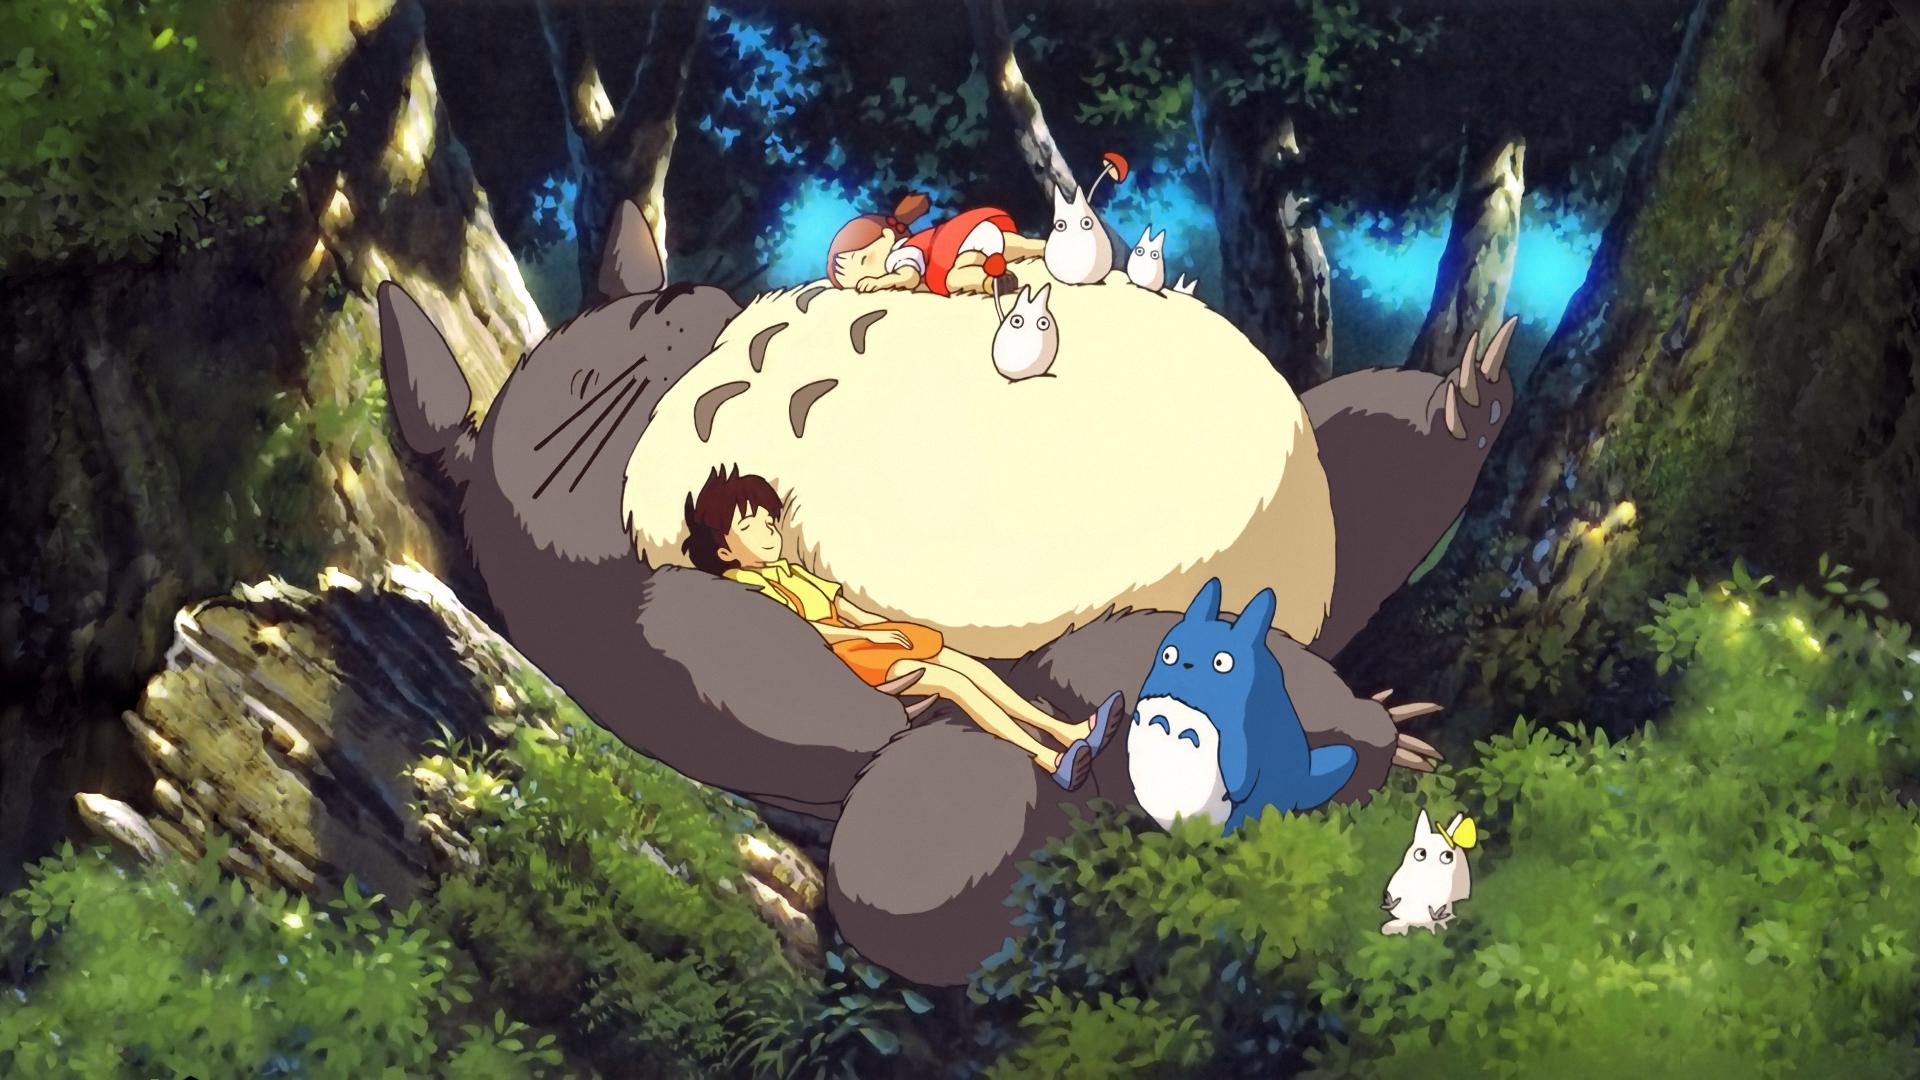 hayao-miyazaki-needs-another-3-to-4-years-to-finish-his-next-film-social.jpg